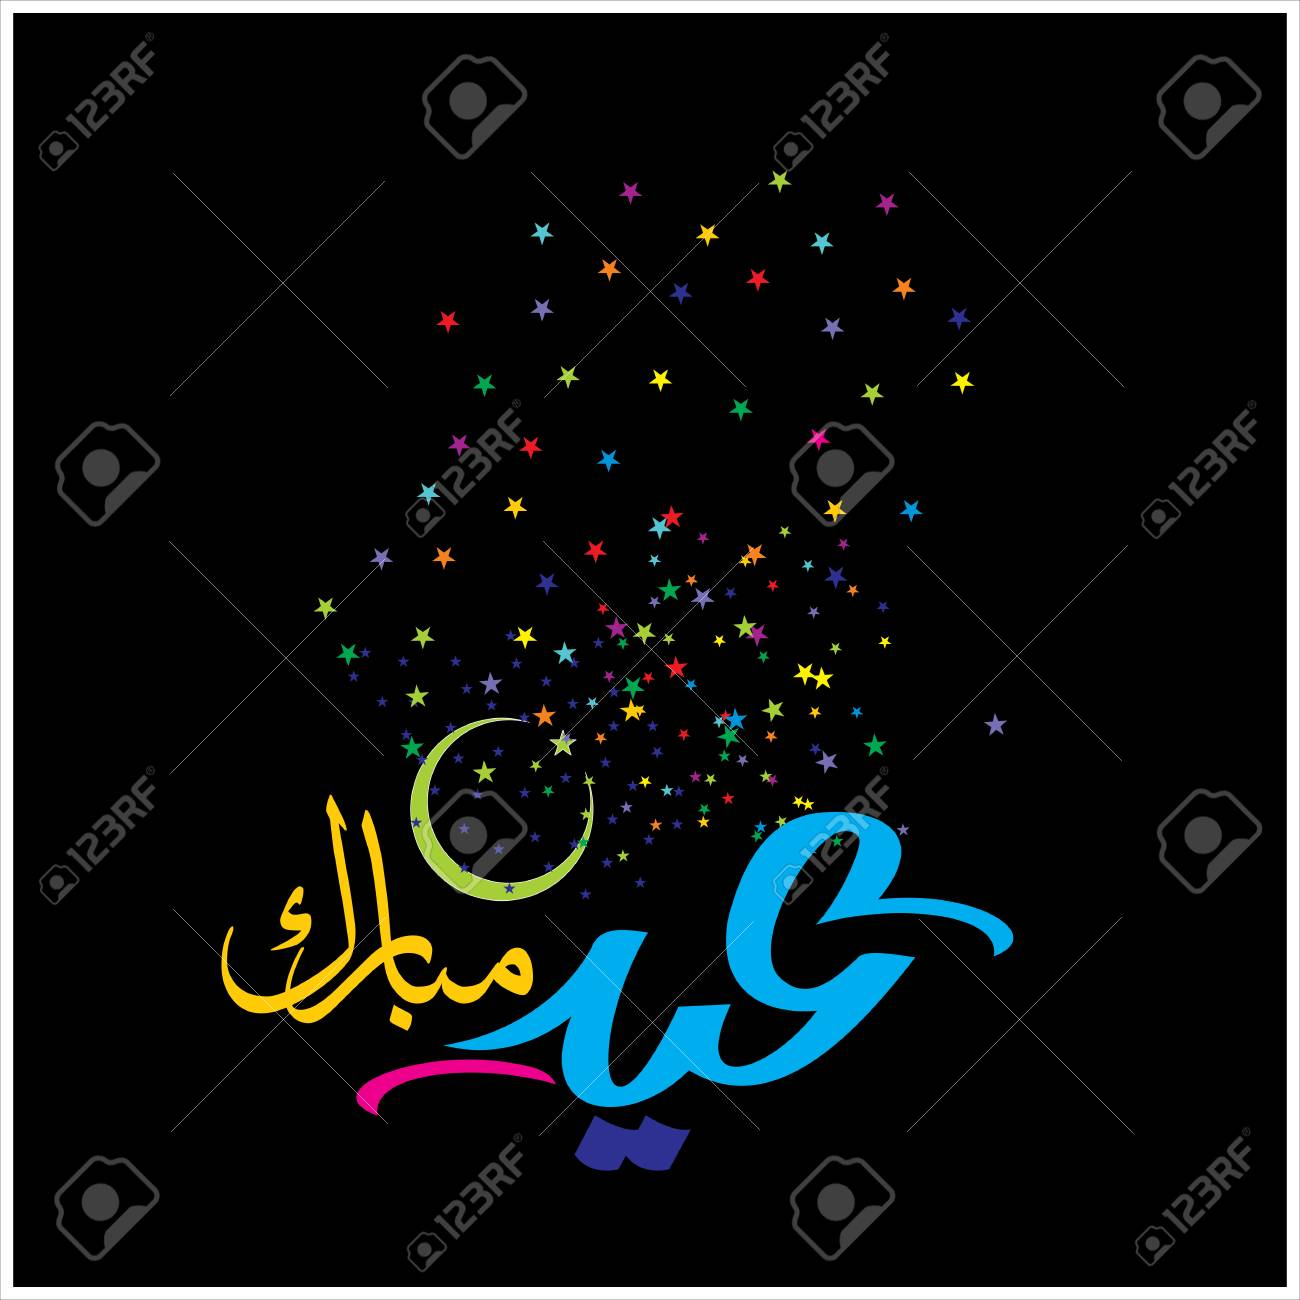 Happy eid mubarak arabic calligraphy for greeting card muslims happy eid mubarak arabic calligraphy for greeting card muslims celebrating festival stock vector 99825603 m4hsunfo